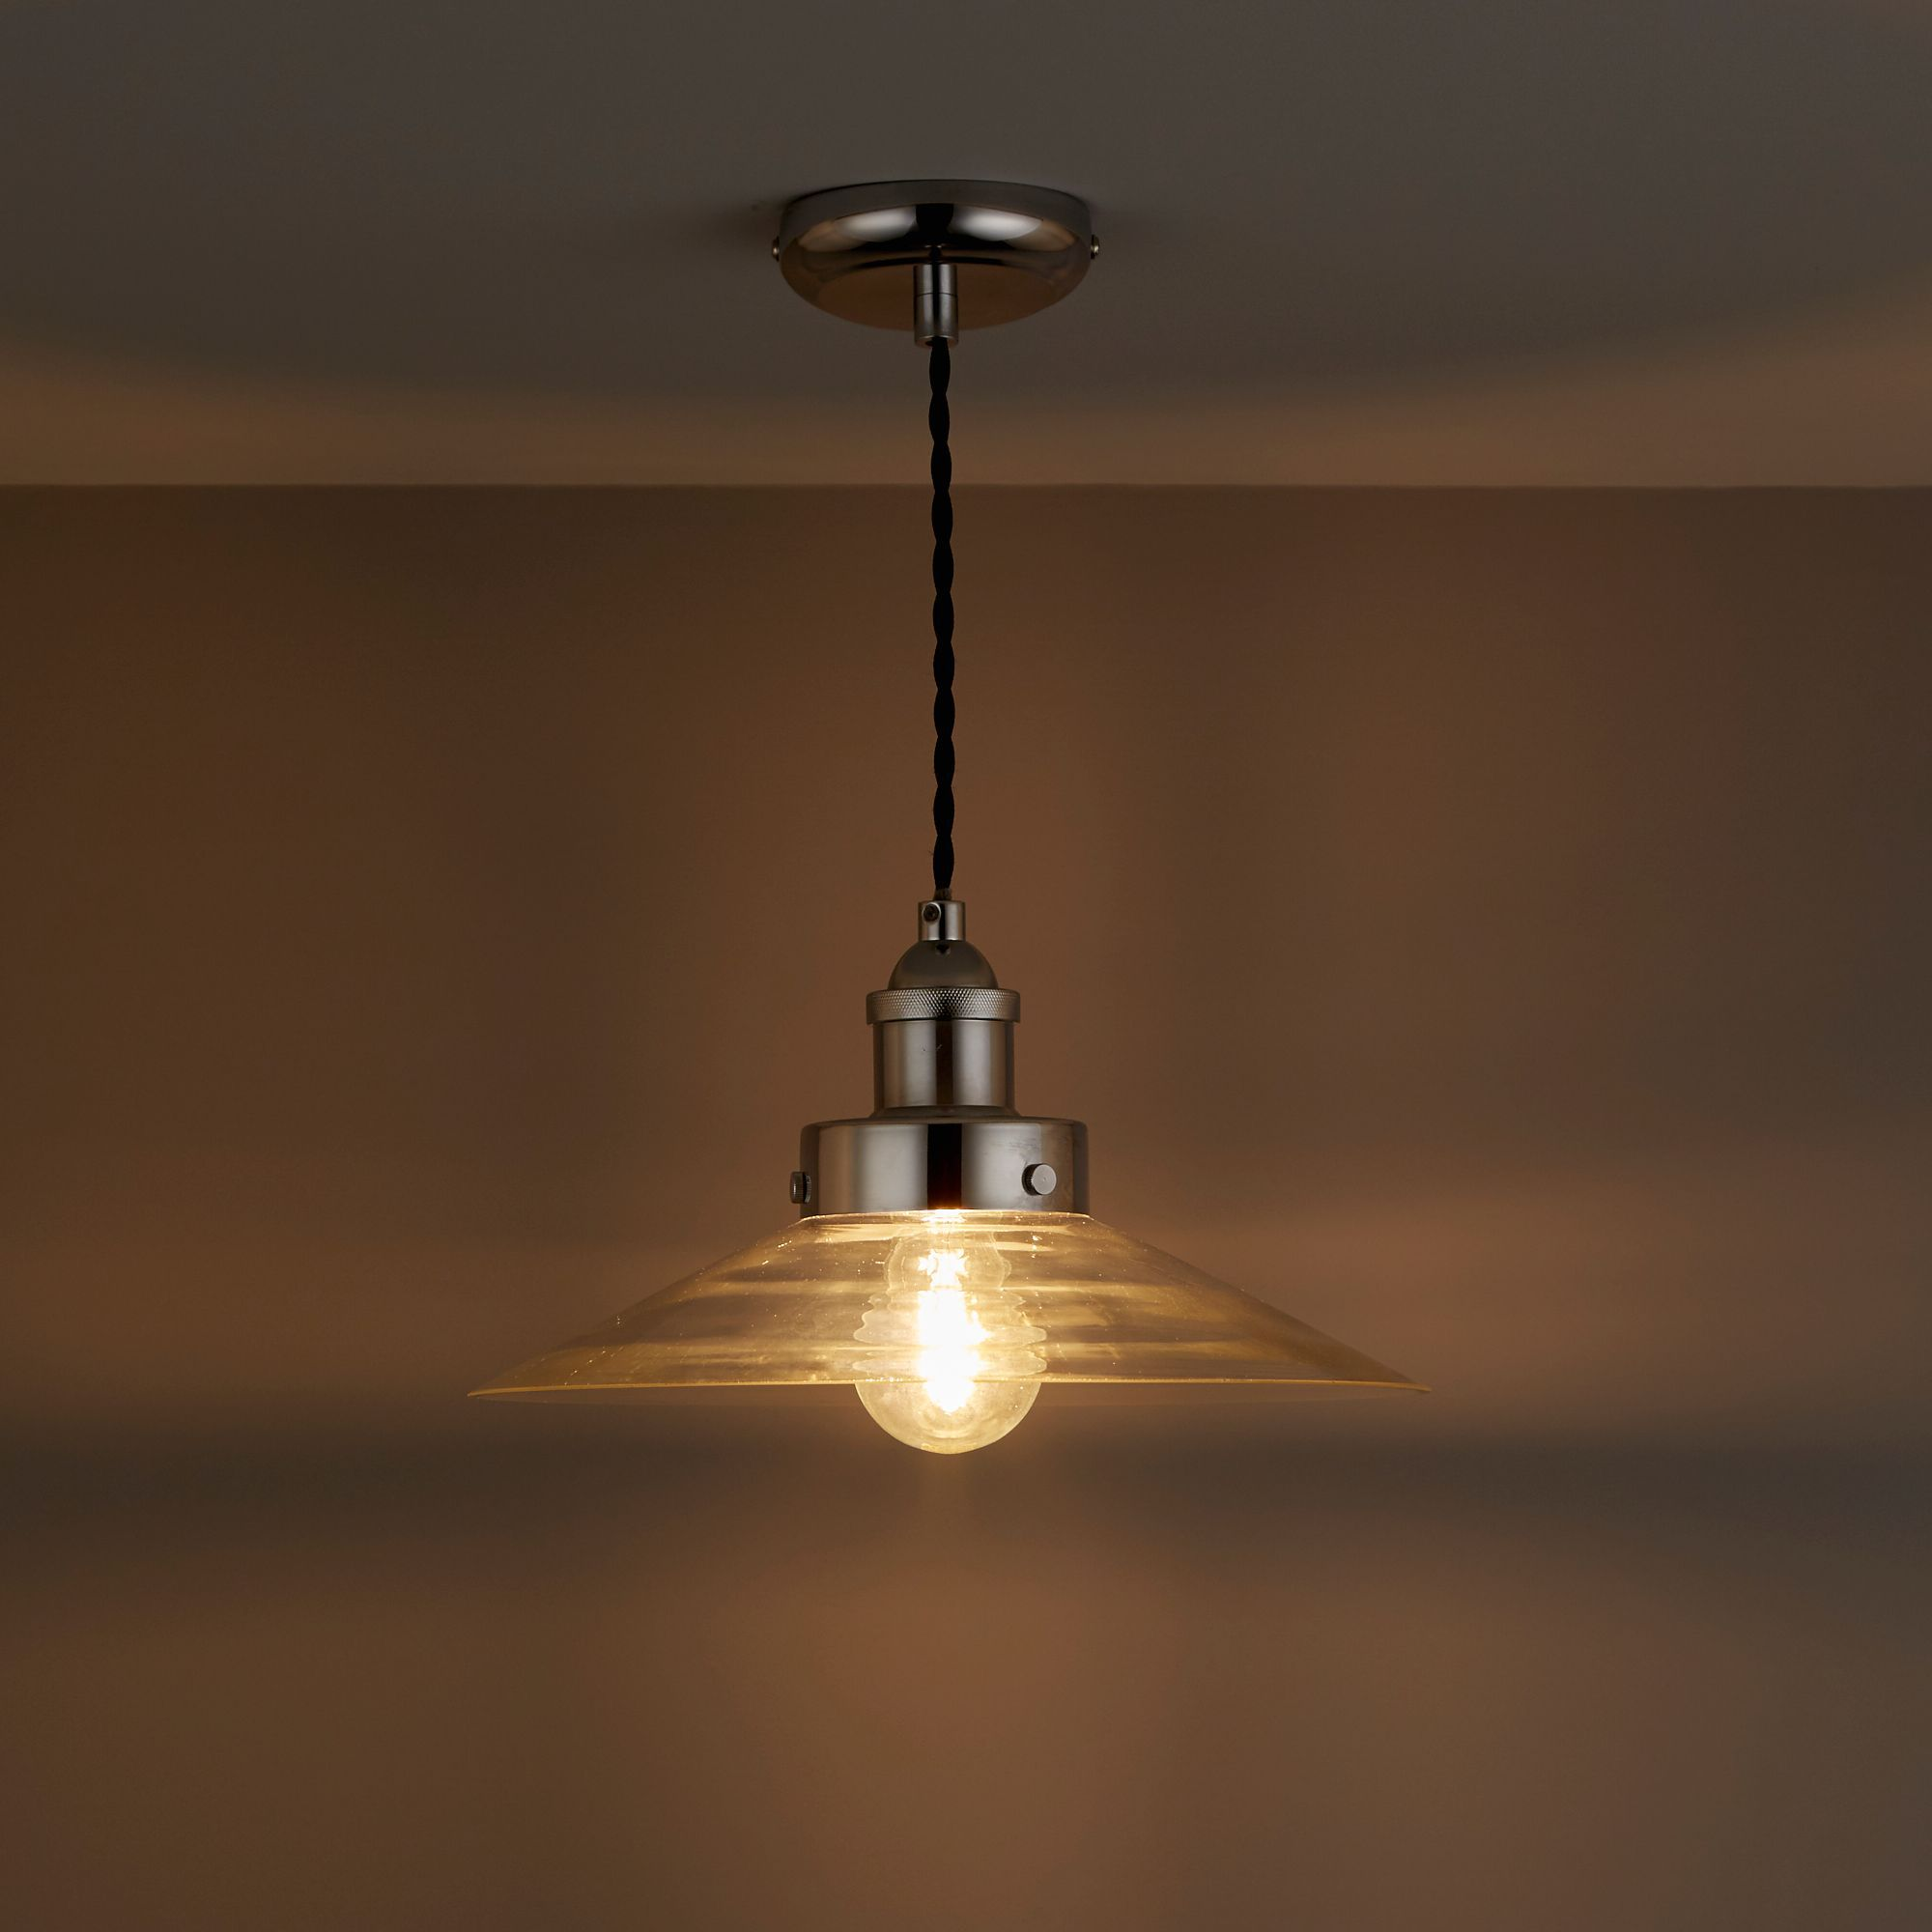 Penny Chrome Effect Pendant Ceiling Light | Departments